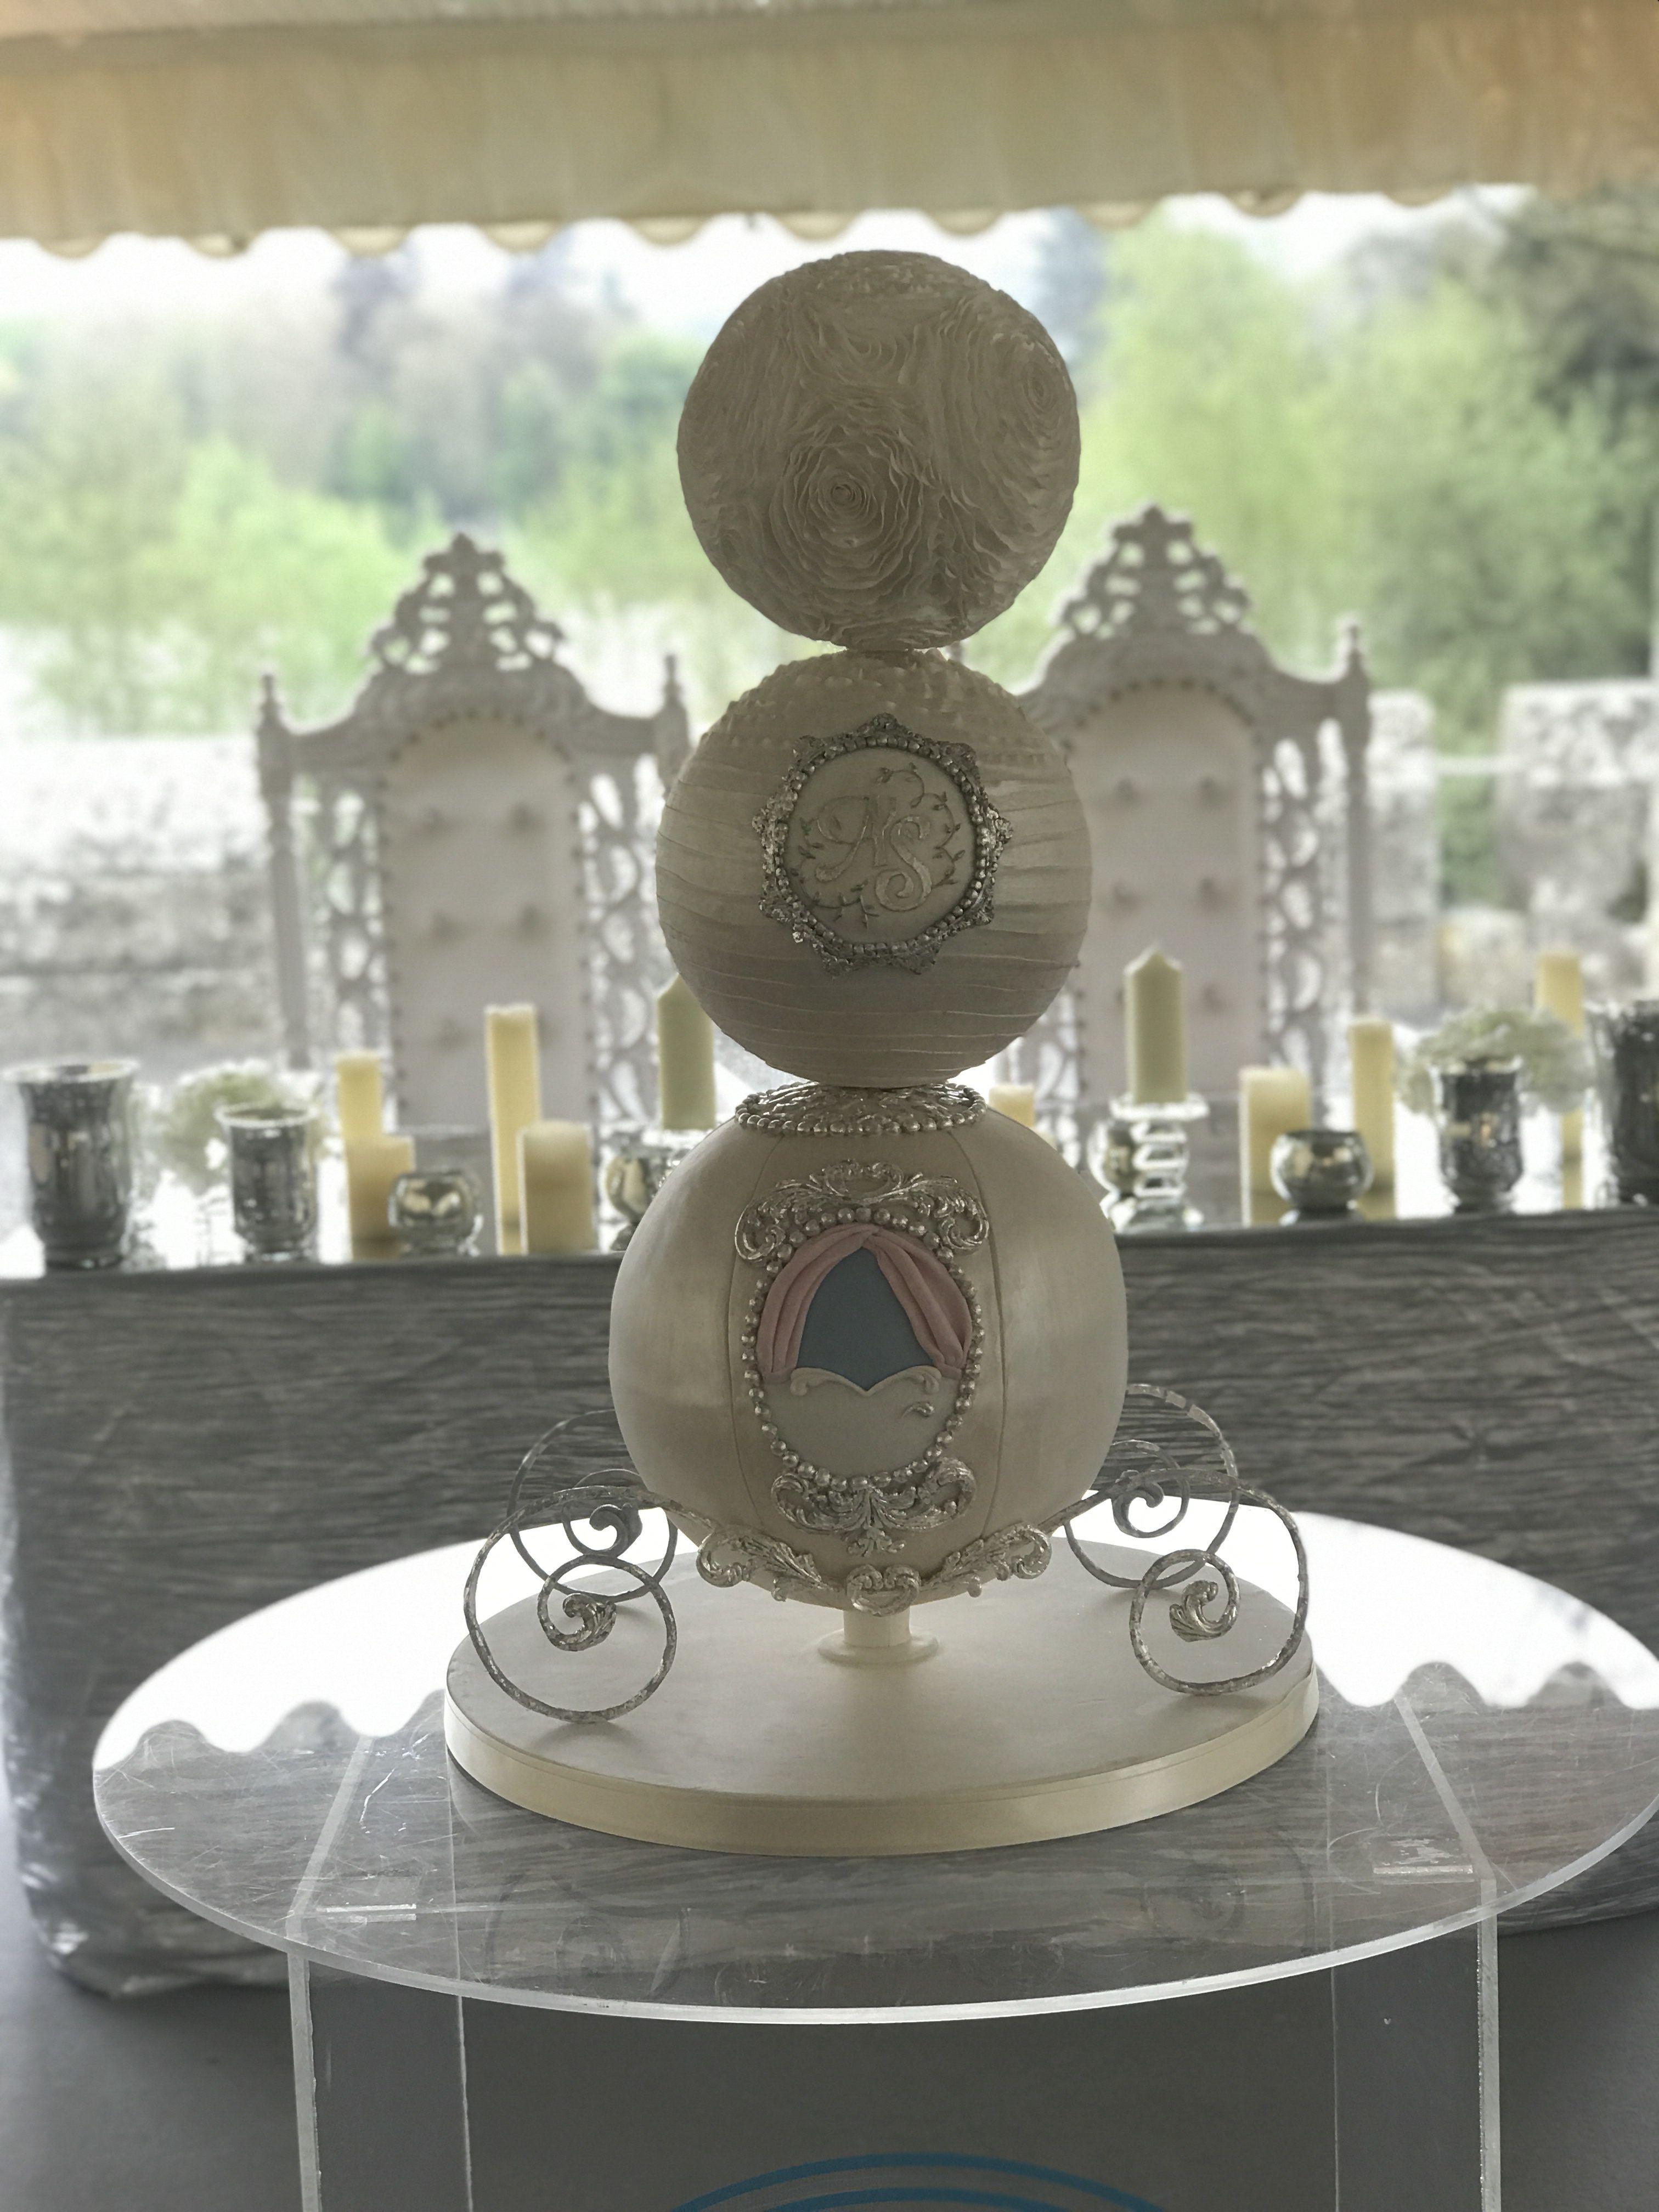 Cinderella Themed Wedding Cake Wedding Pinterest Cinderella